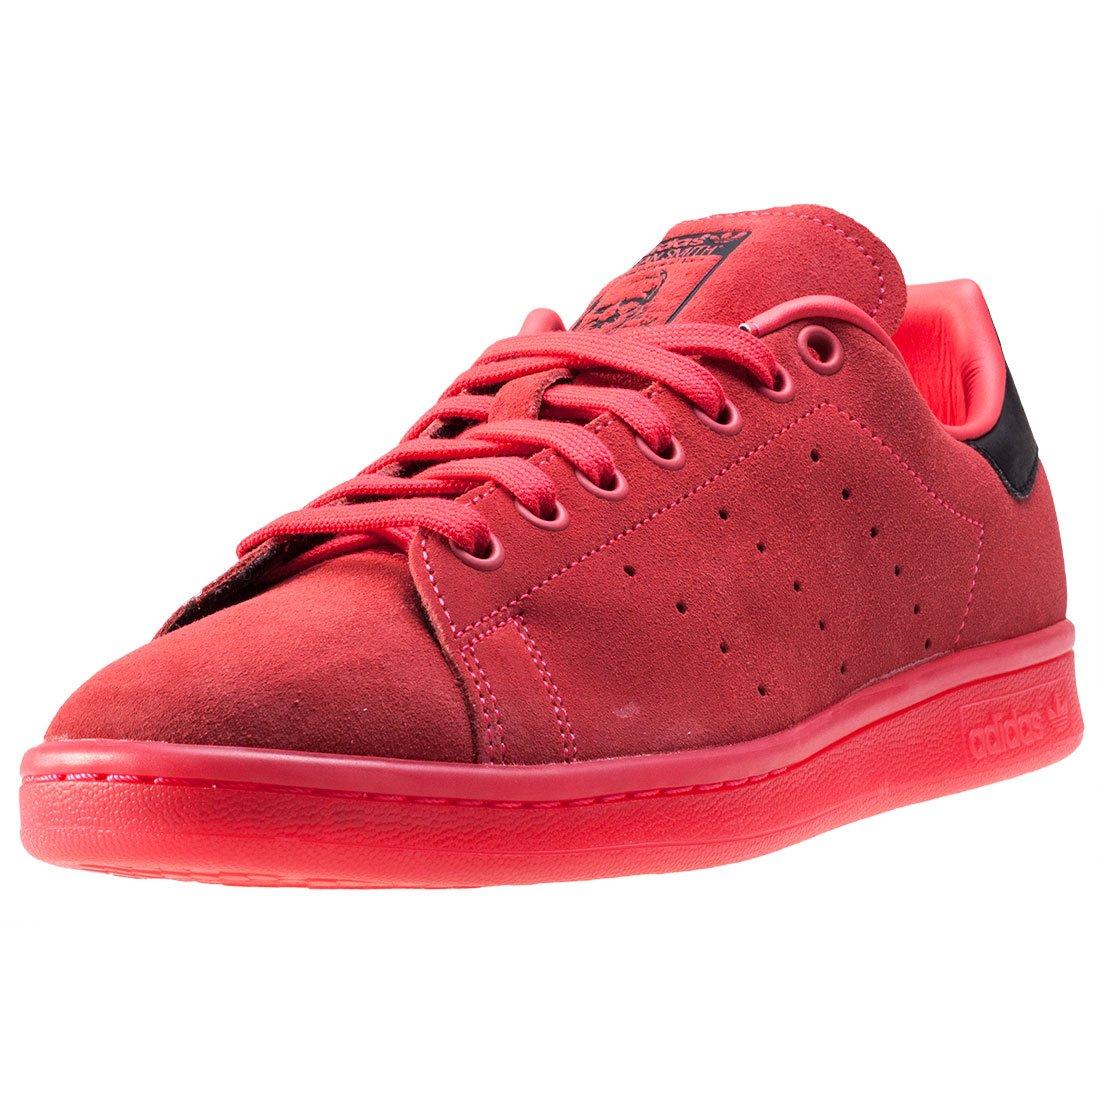 Adidas Stan Smith Uomo Formatori